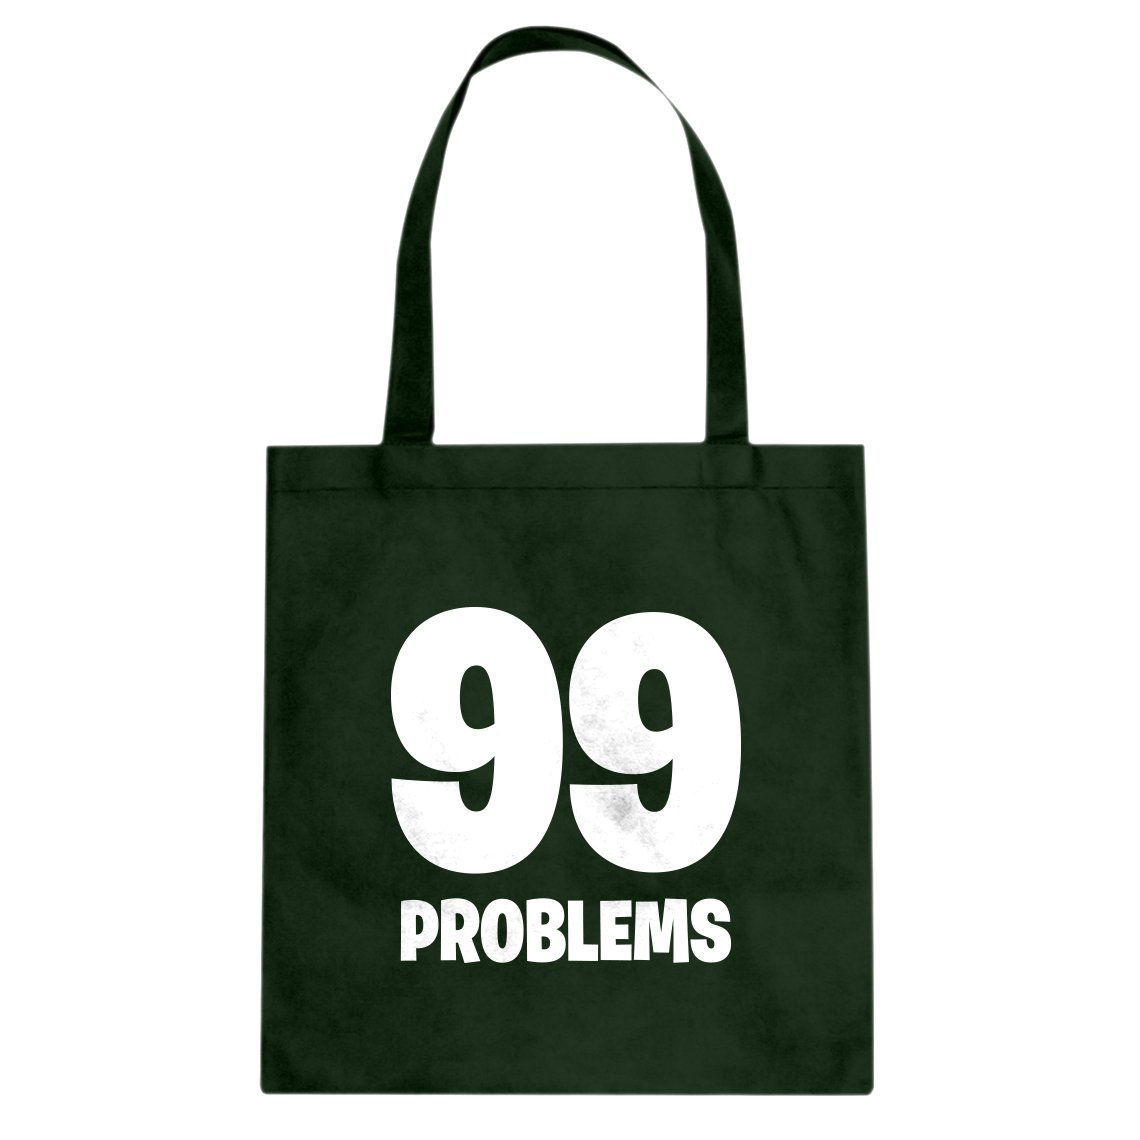 Indica Plateau 99 Problems Cotton Canvas Tote Bag